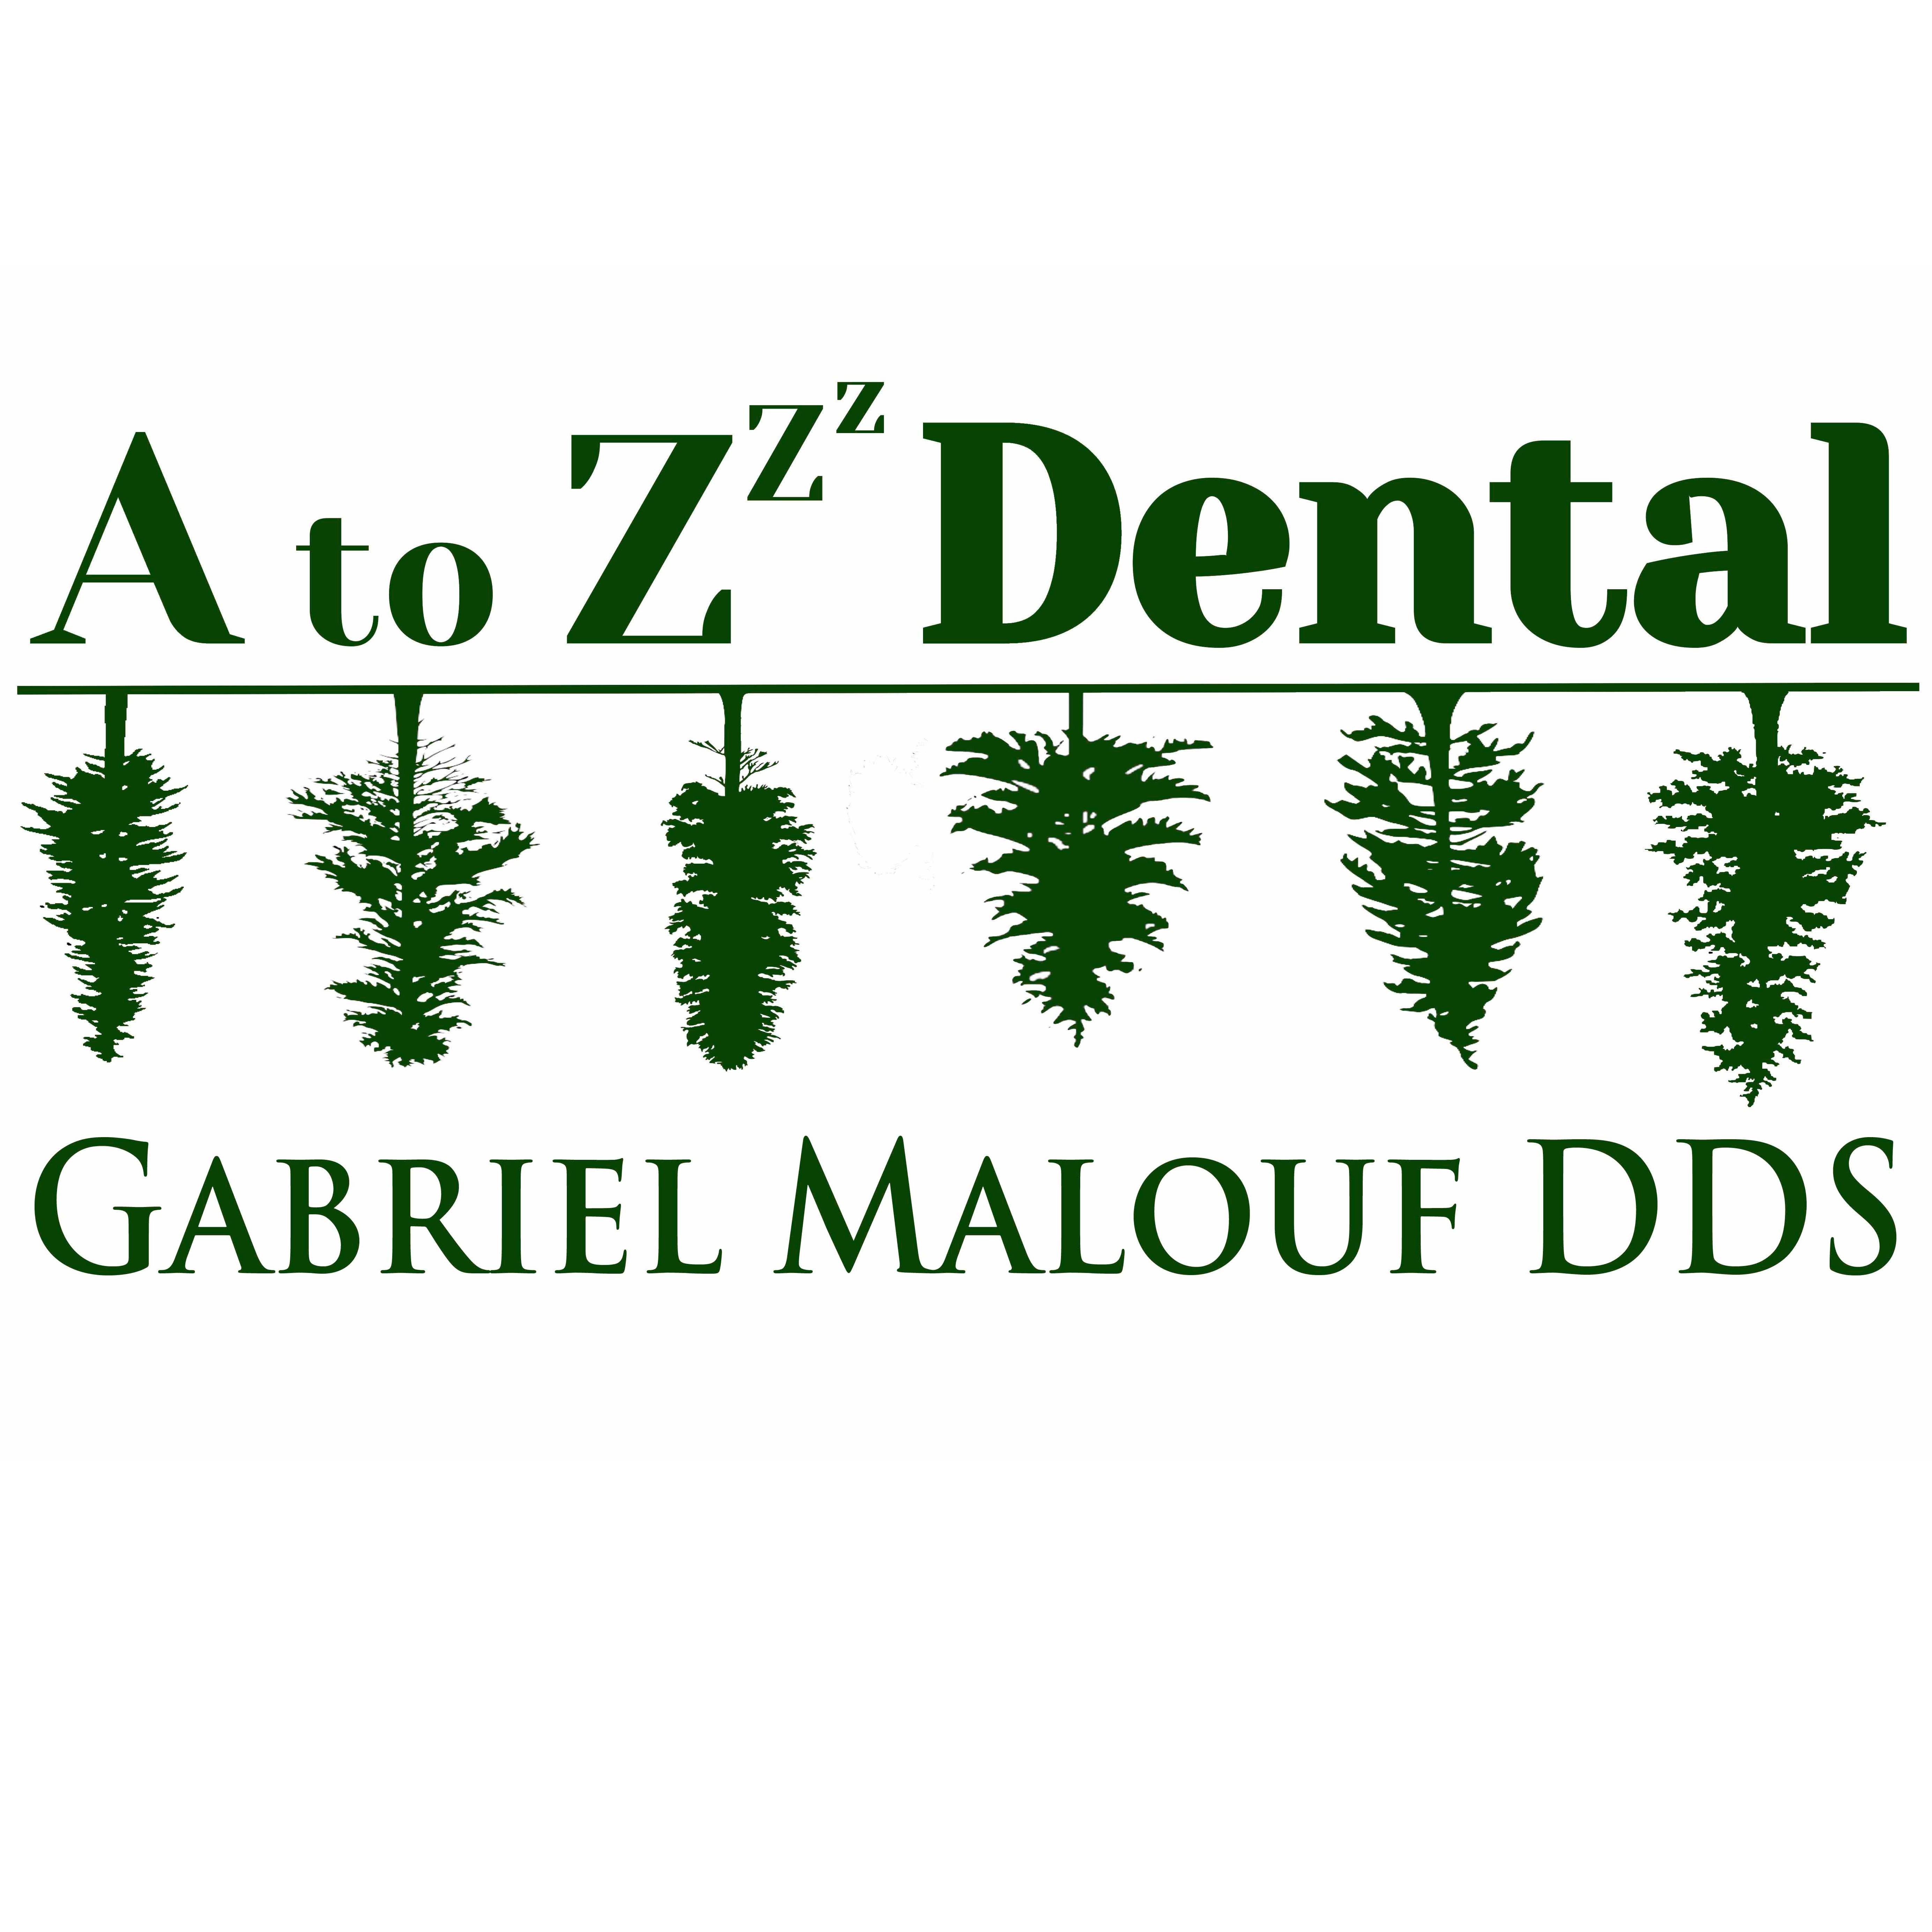 A to Zzz Dental